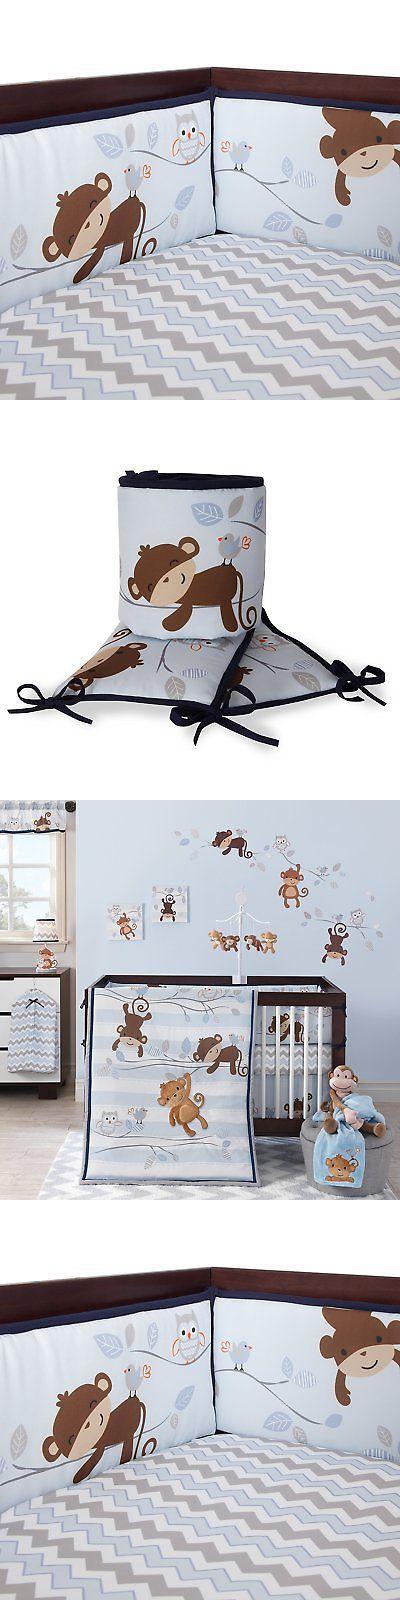 Bumpers 20417: Bedtime Originals Mod Monkey Bumper -> BUY IT NOW ONLY: $64.98 on eBay!